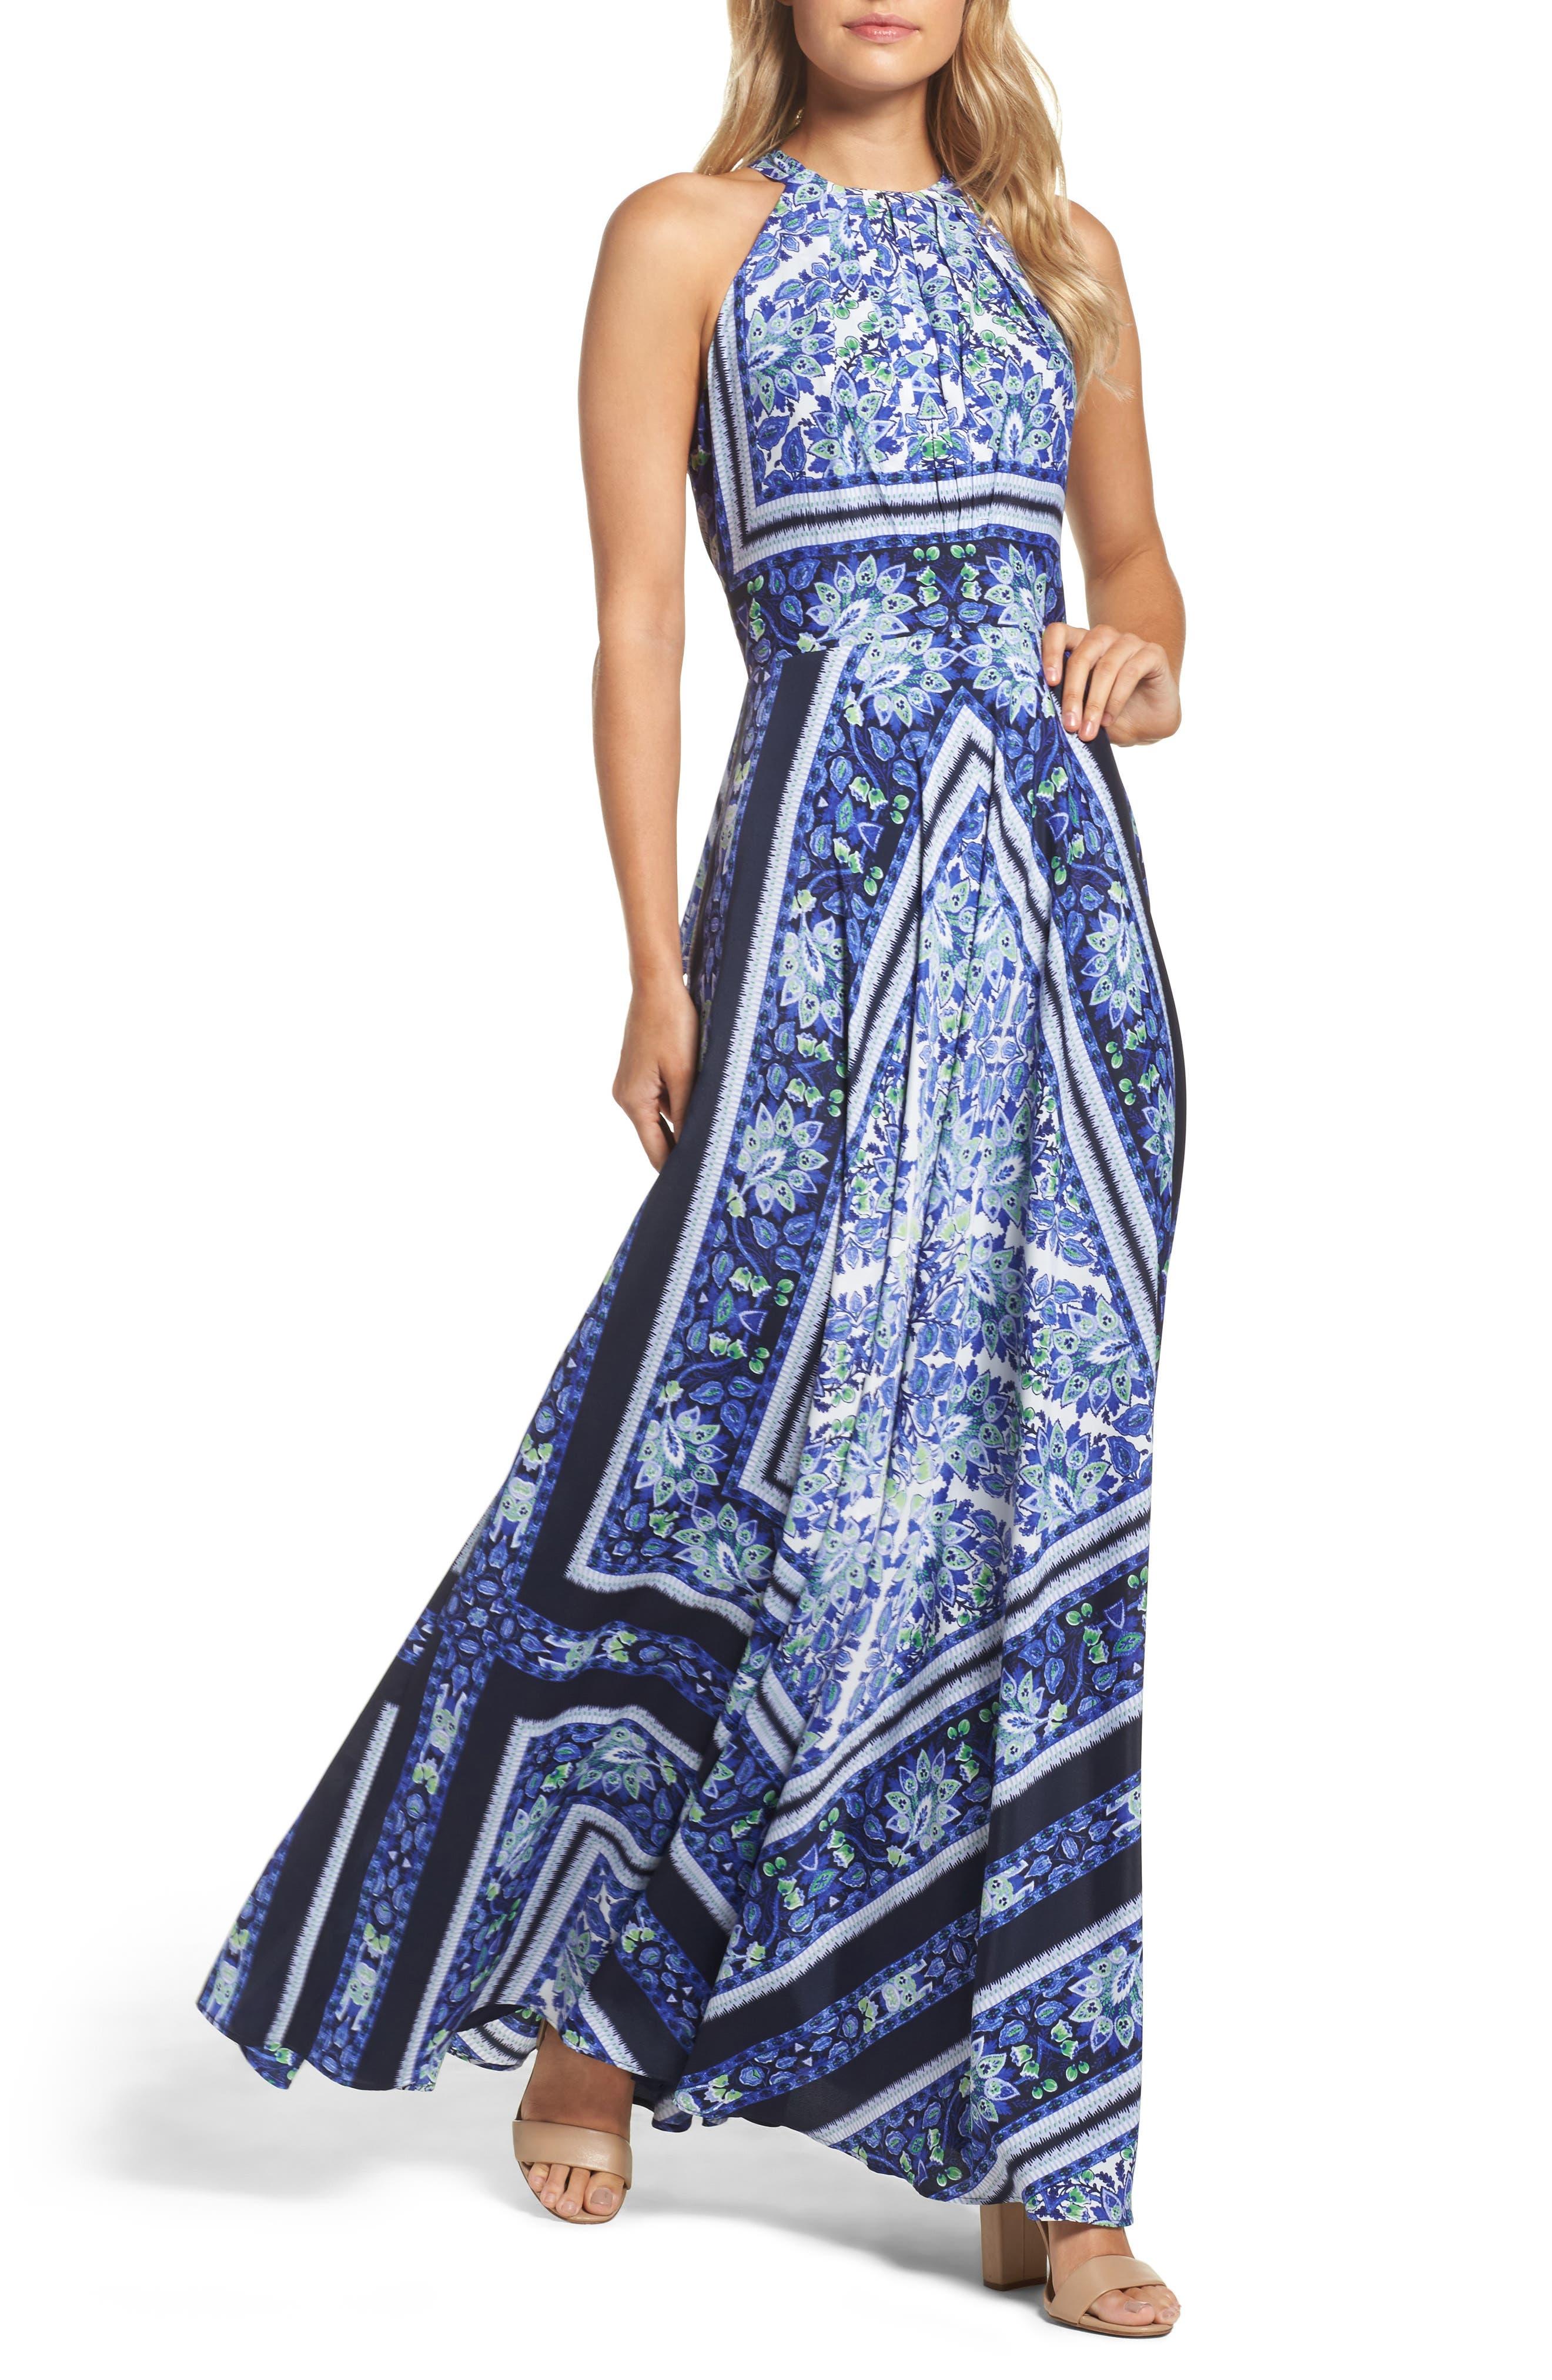 Main Image - Eliza J Scarf Print Maxi Dress (Regular & Petite)